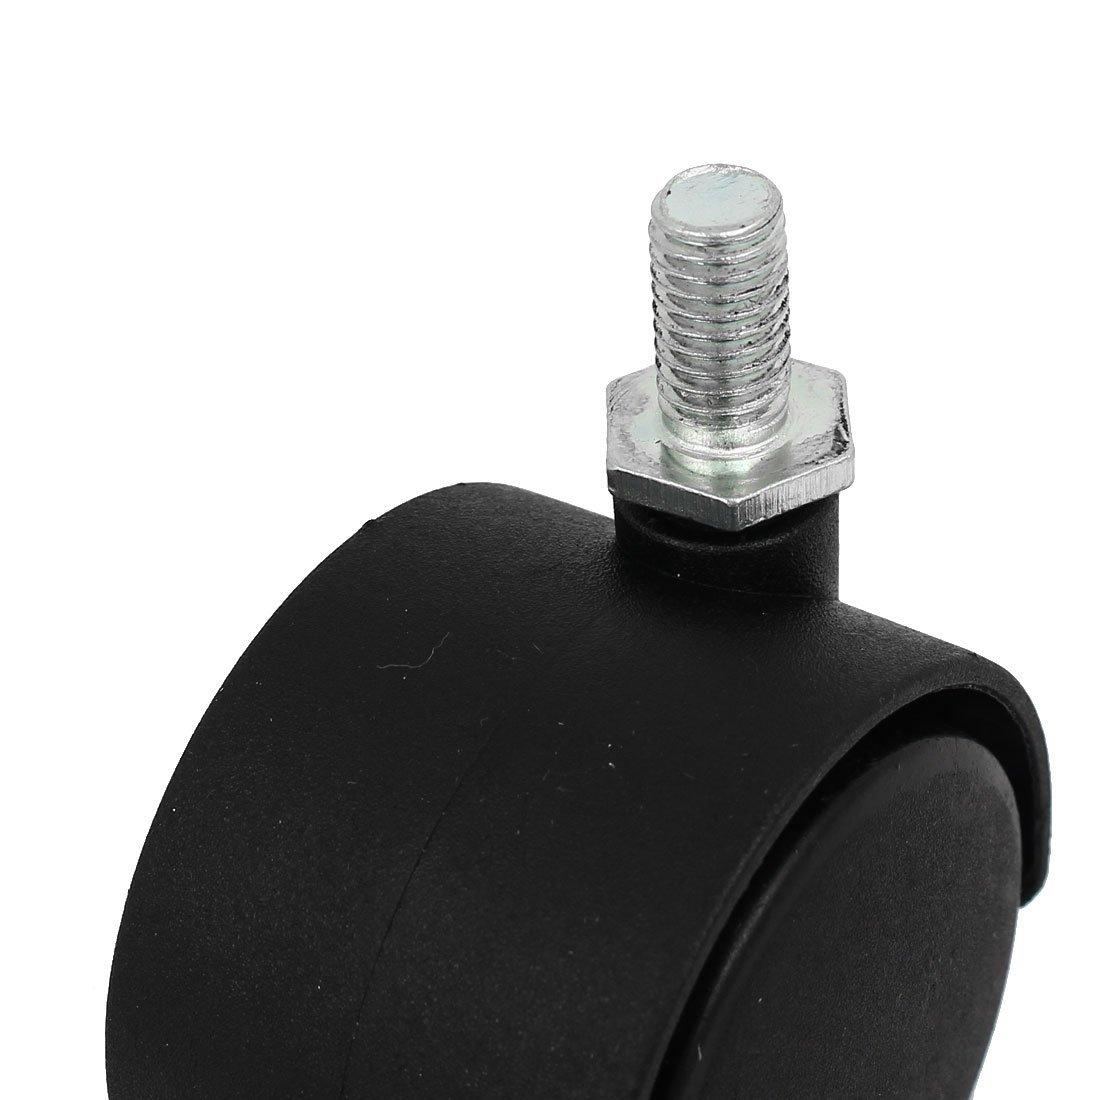 M8 x 15mm Threaded Rod 1.5 inch Diameter Swivel Wheel Without Brake 4PCS Wheel for Chair